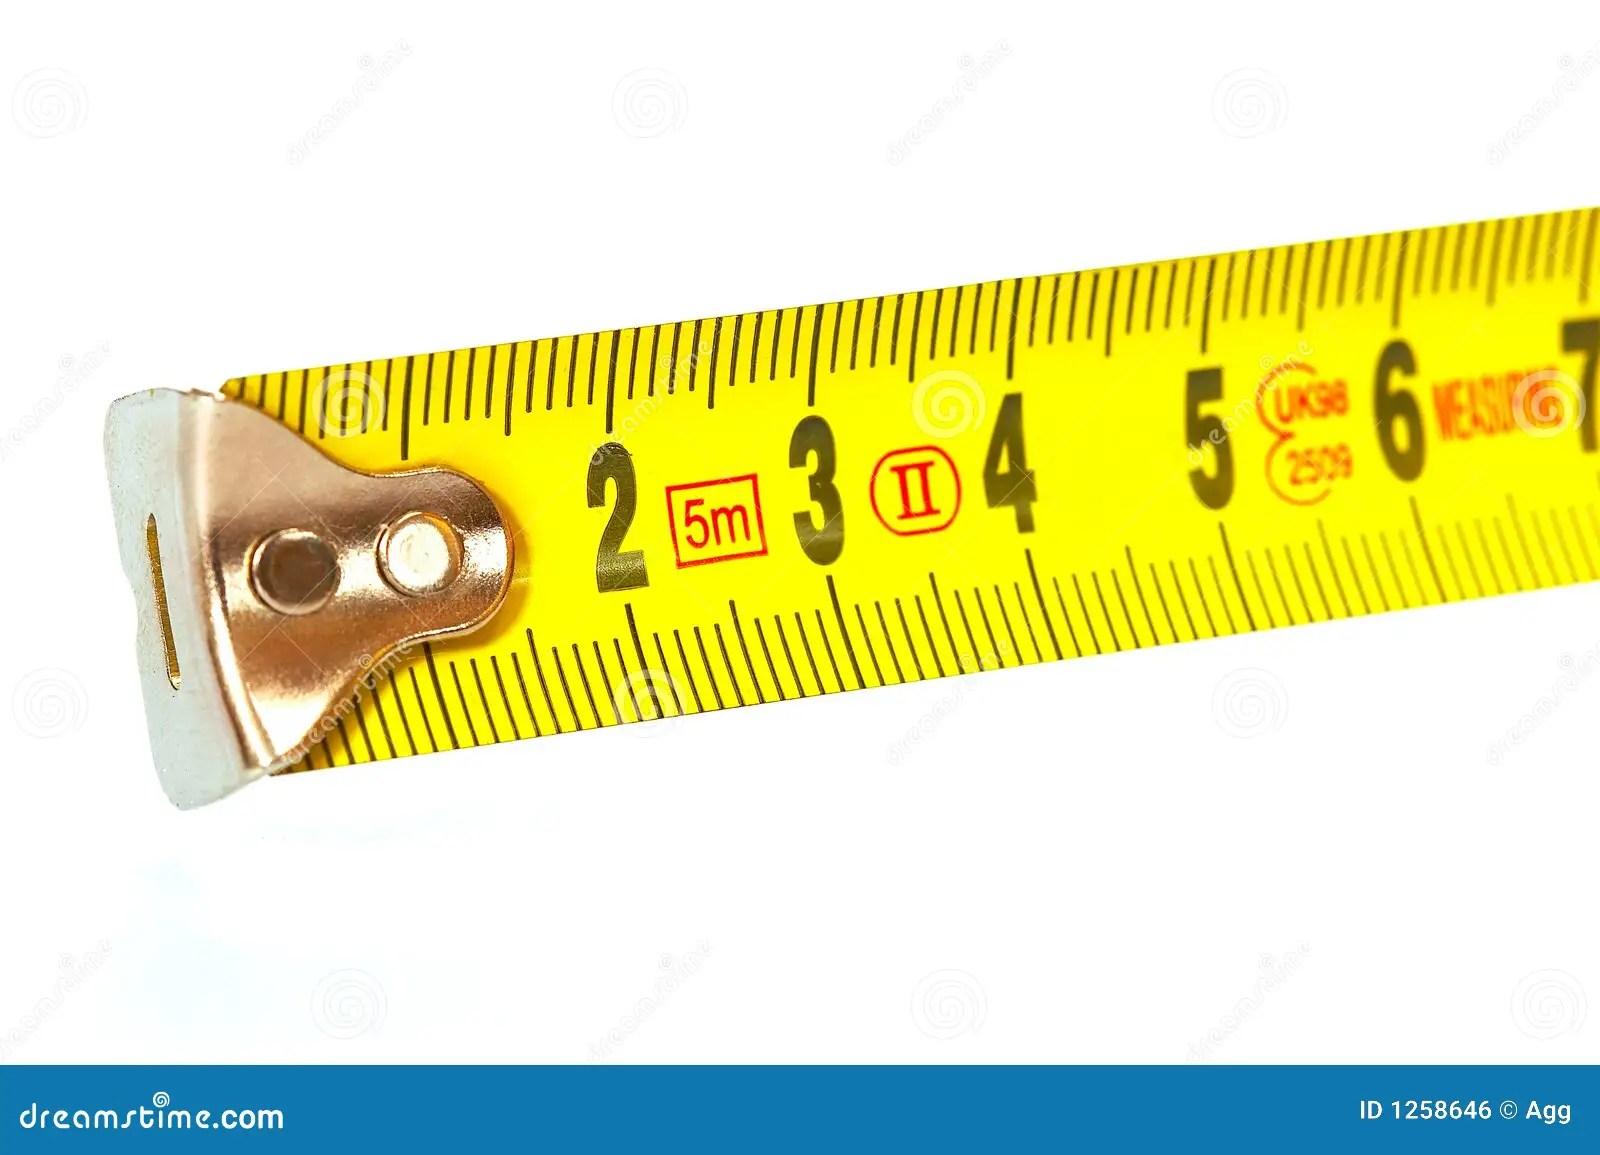 Measure Ruler Royalty Free Stock Image